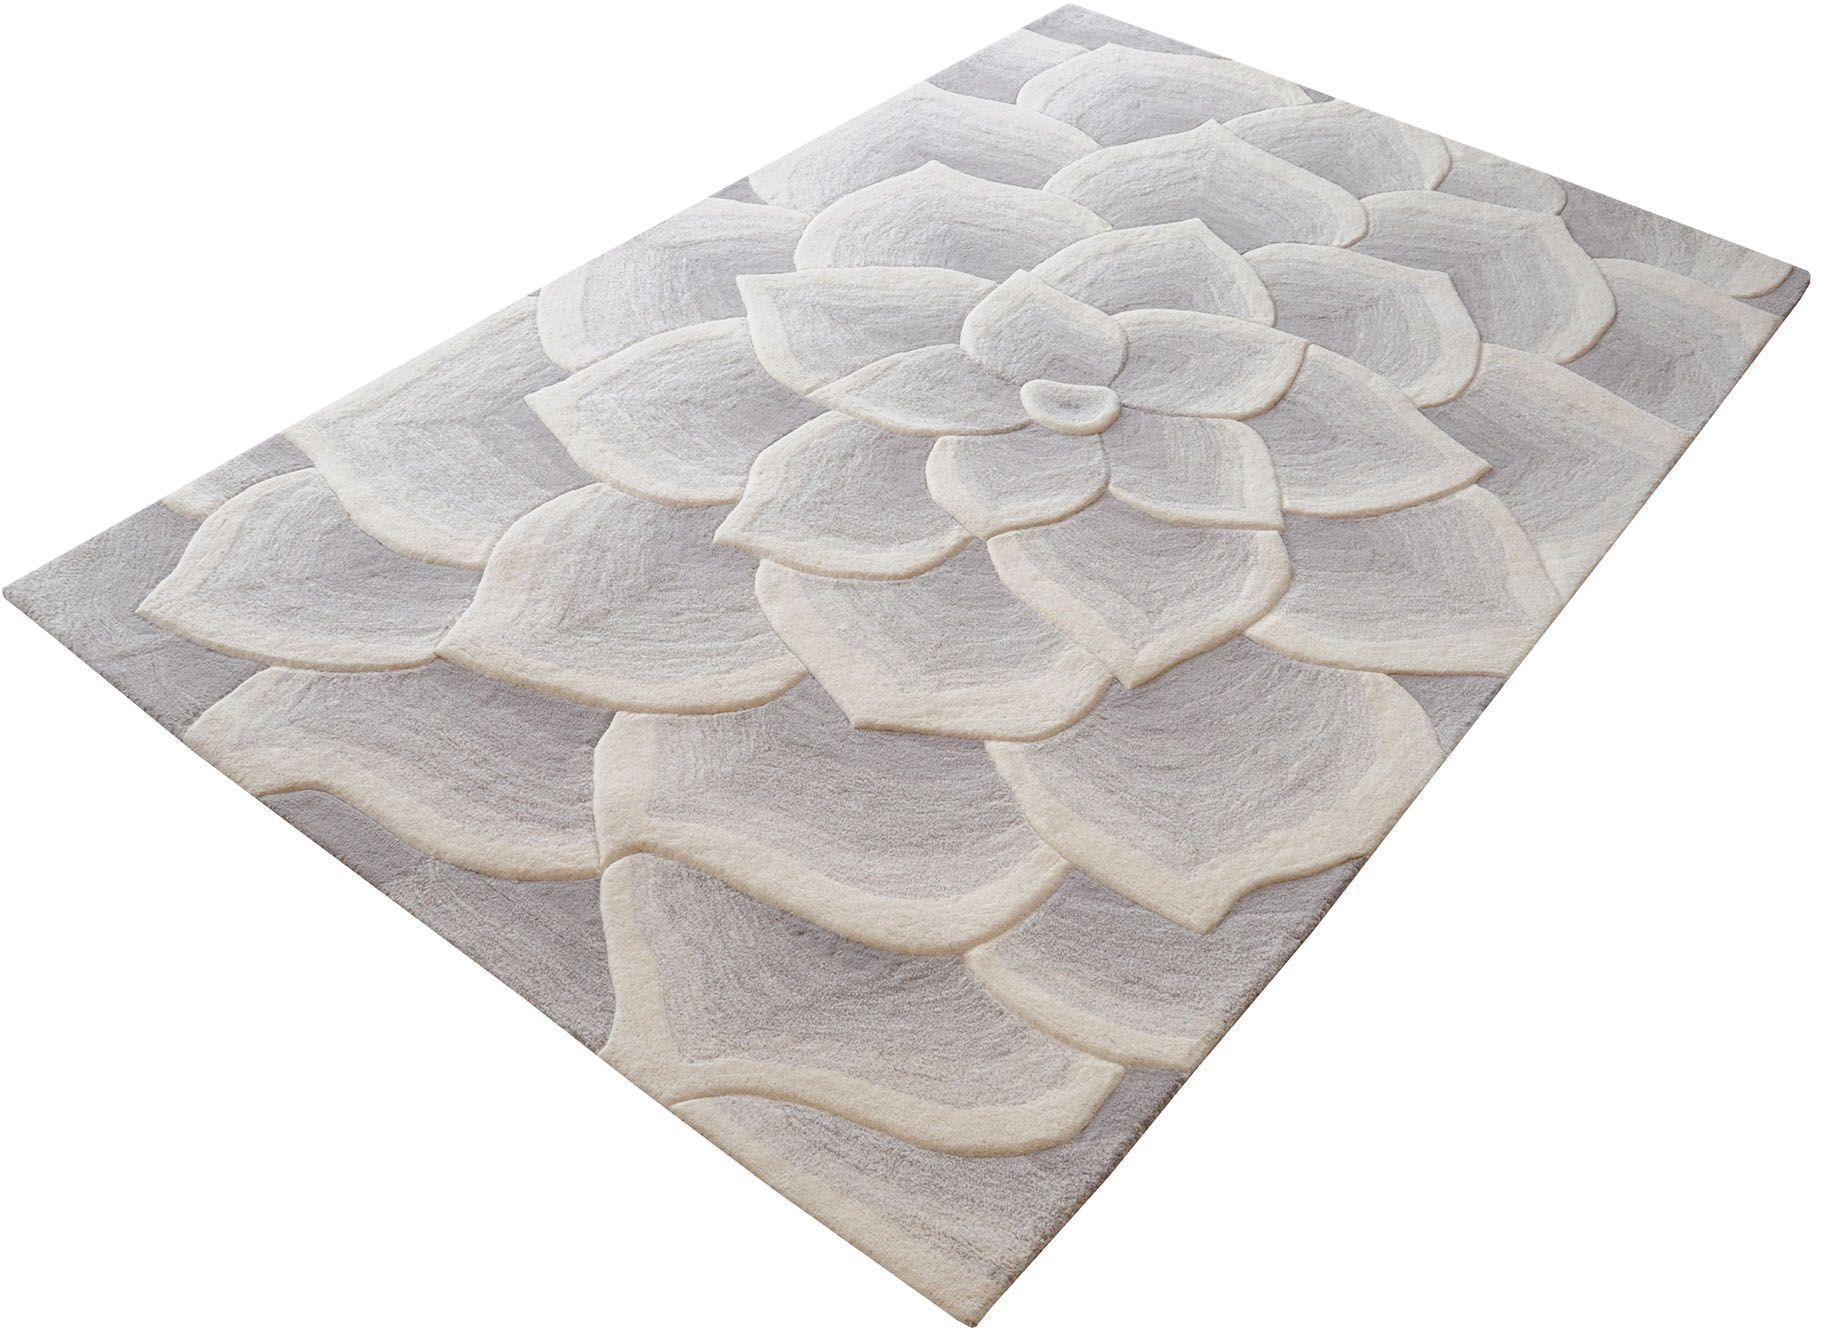 kallista handtufted wool grey and white small rug 8905 040 dimond home. Black Bedroom Furniture Sets. Home Design Ideas